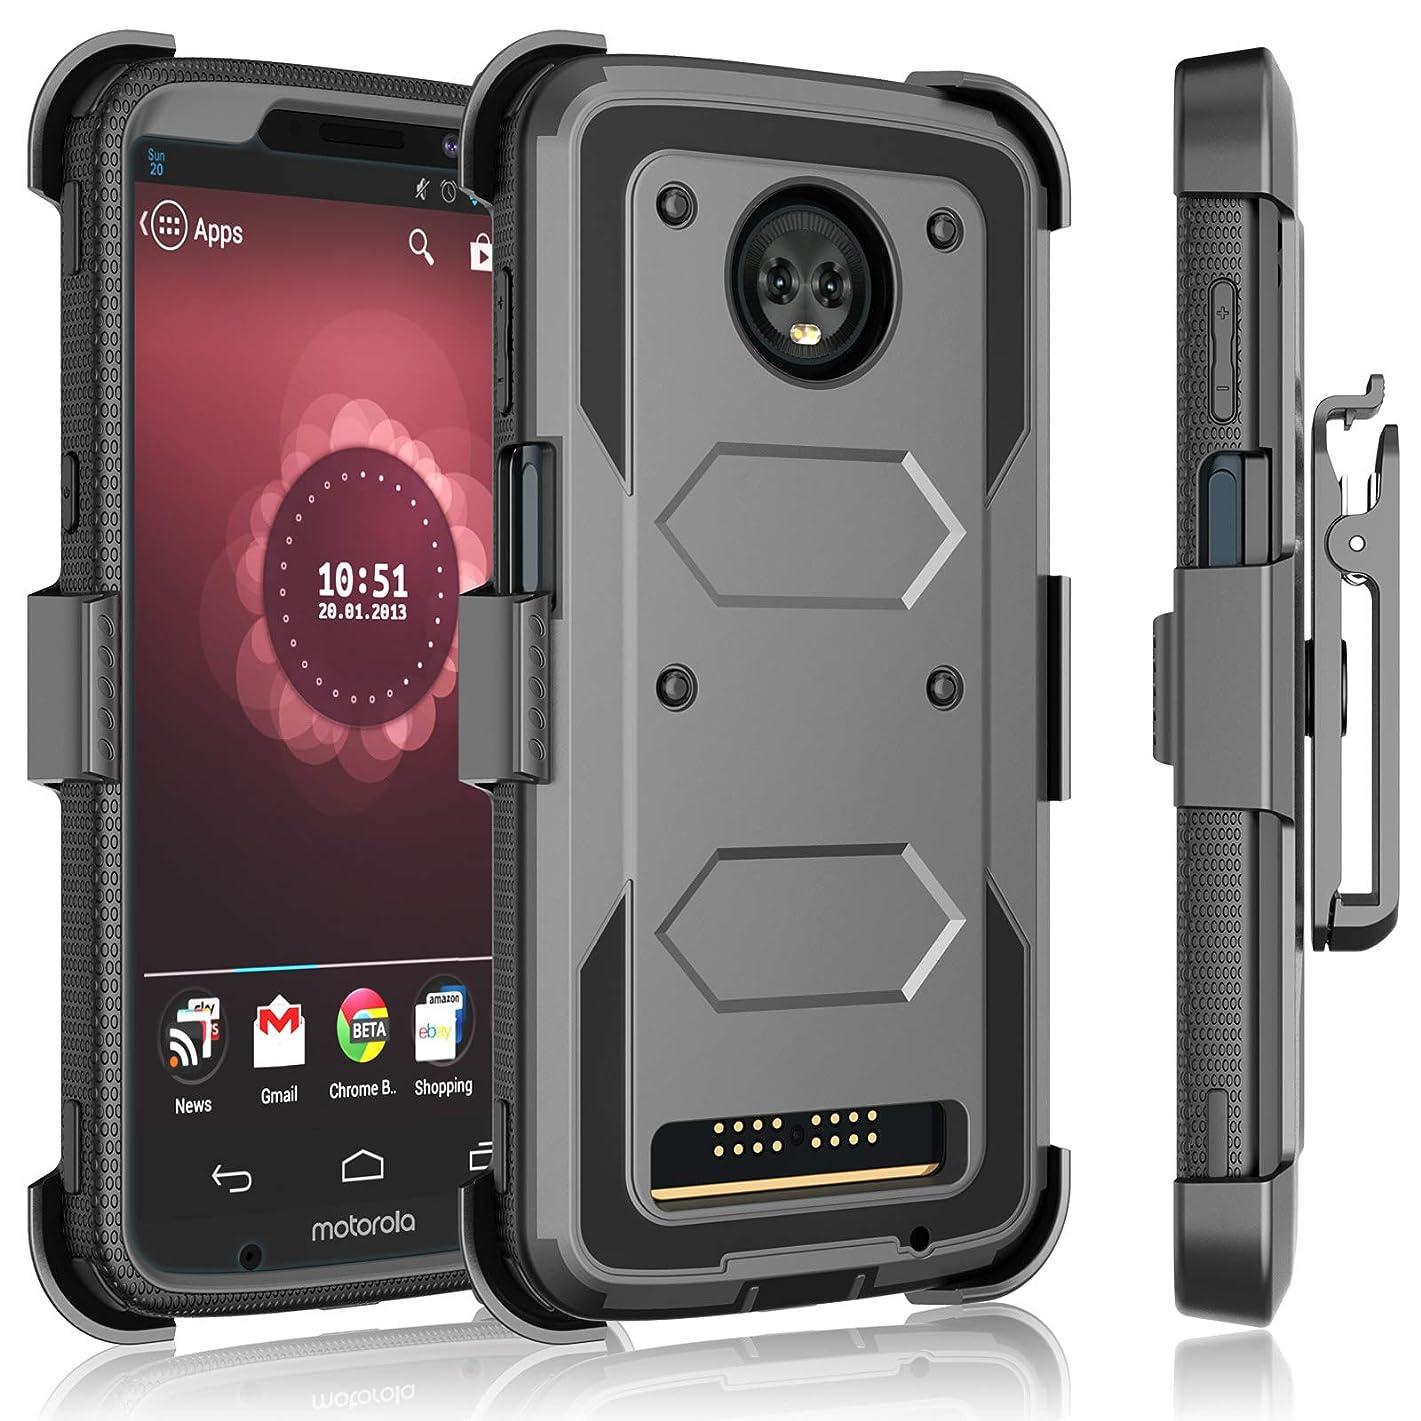 Tekcoo for Motorola Moto Z3 Play Case/Verizon Moto Z3 Holster Clip, [Tshell] [Built-in Screen] Secure Swivel Locking Belt Defender Full Body Kickstand Carrying Armor Cases Cover [Gray]